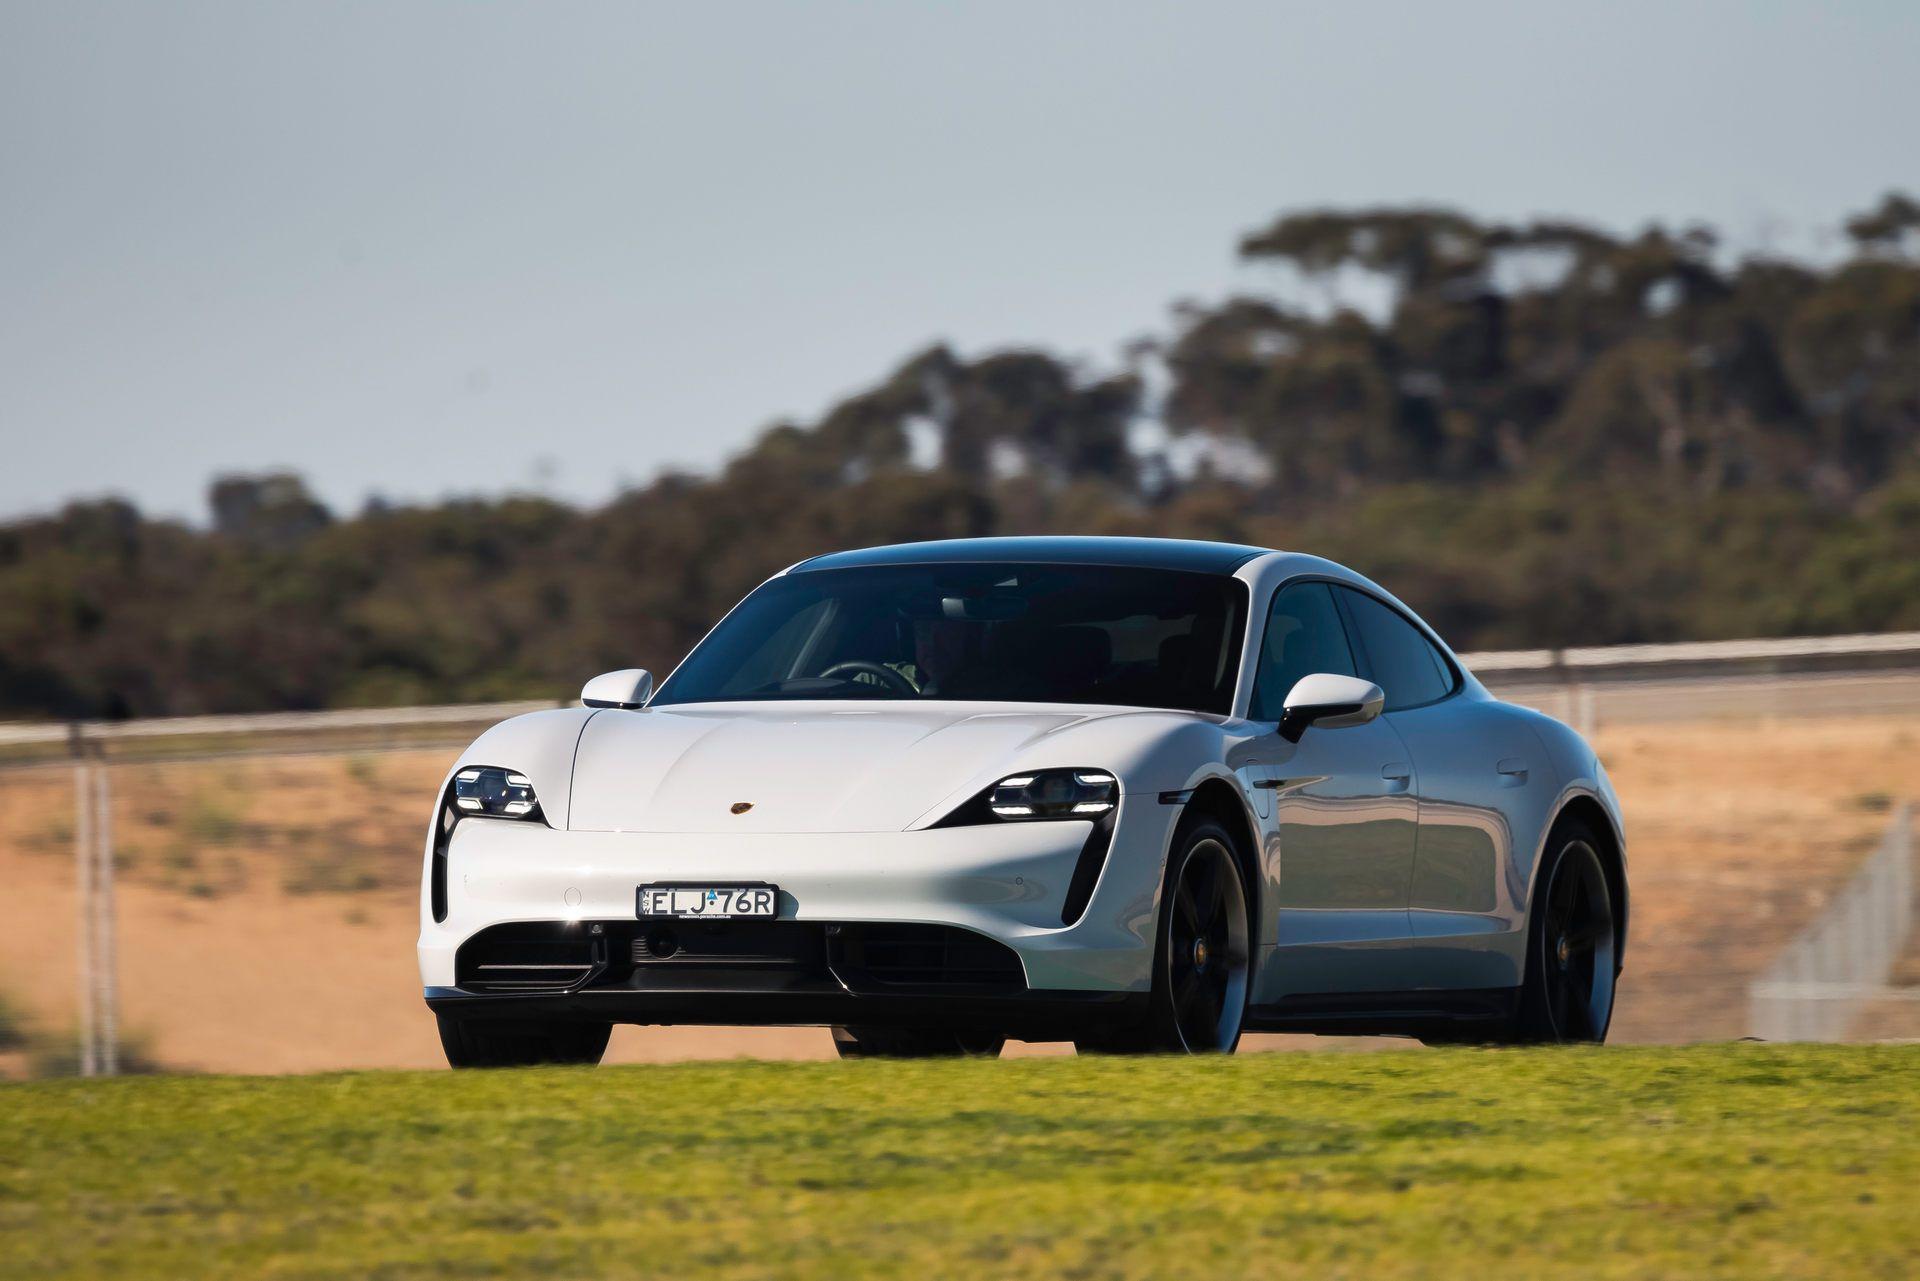 Porsche-Taycan-Turbo-S-The-Bend-Motorsport-Park-34